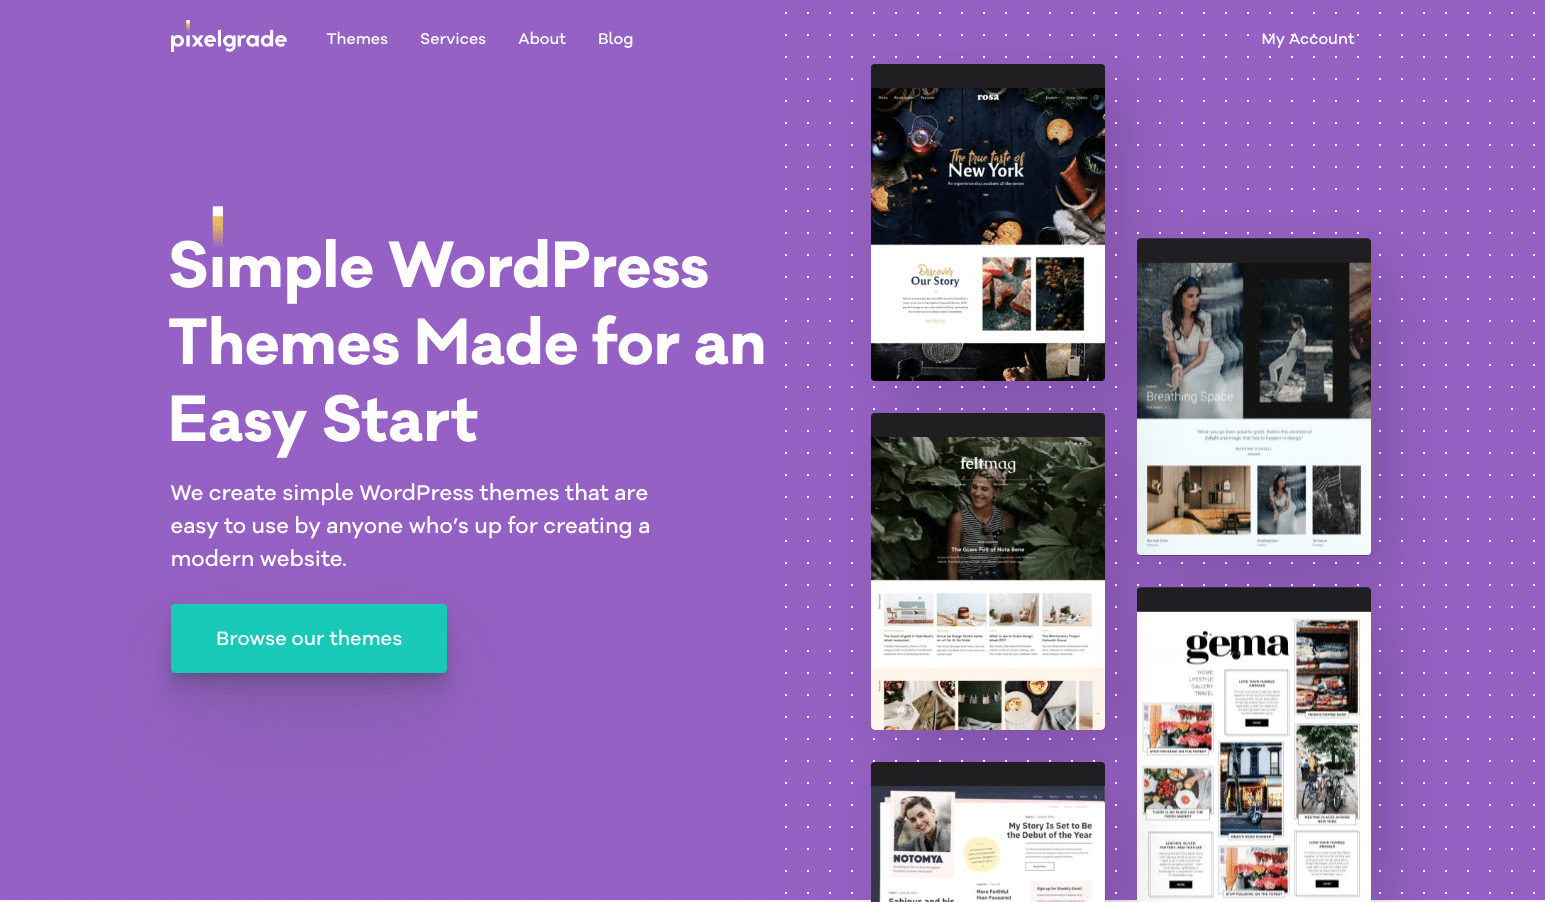 Pixelgrade Theme Company